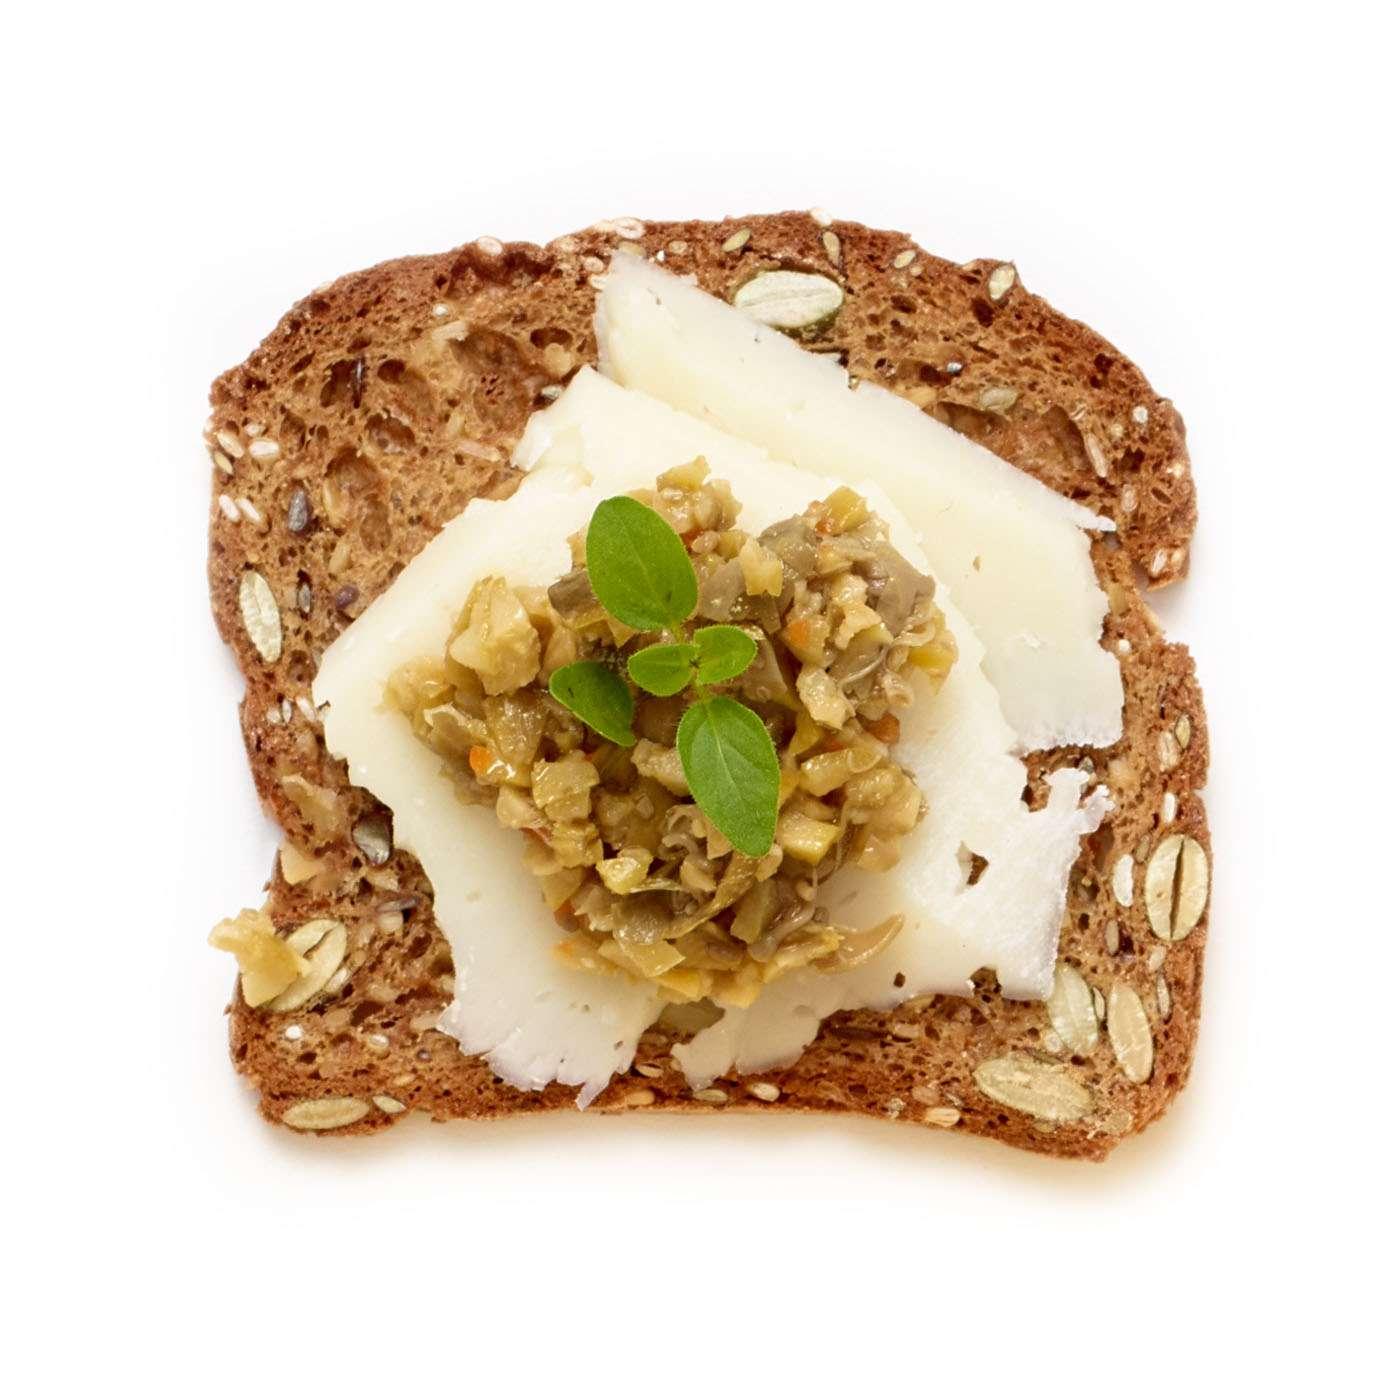 lesley stowe raincoast oat crisps™ Oat and Seed